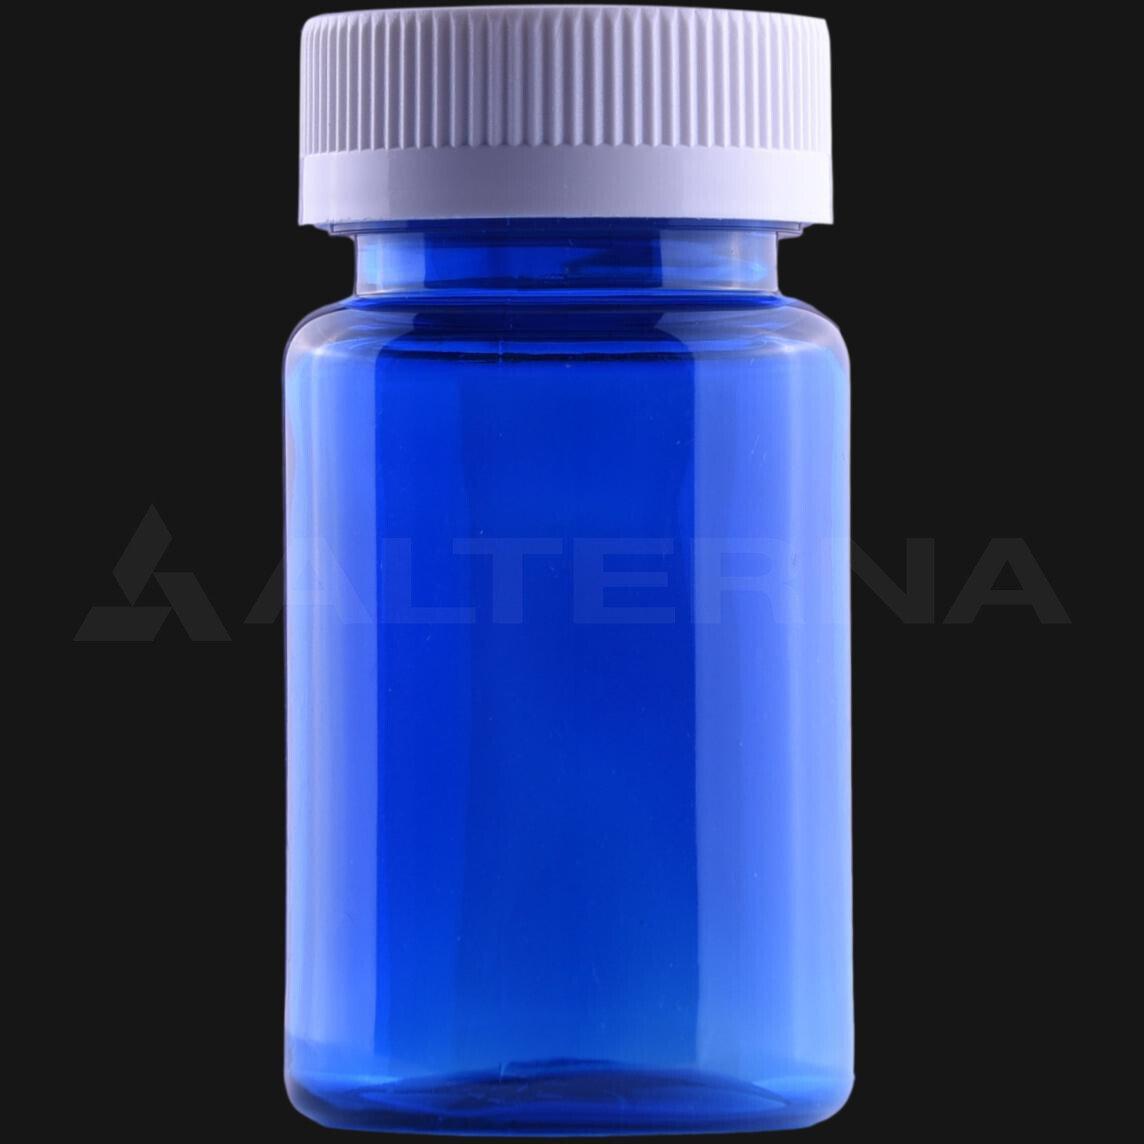 100 ml PET Pill Bottle with 38 mm Child Resistant Cap